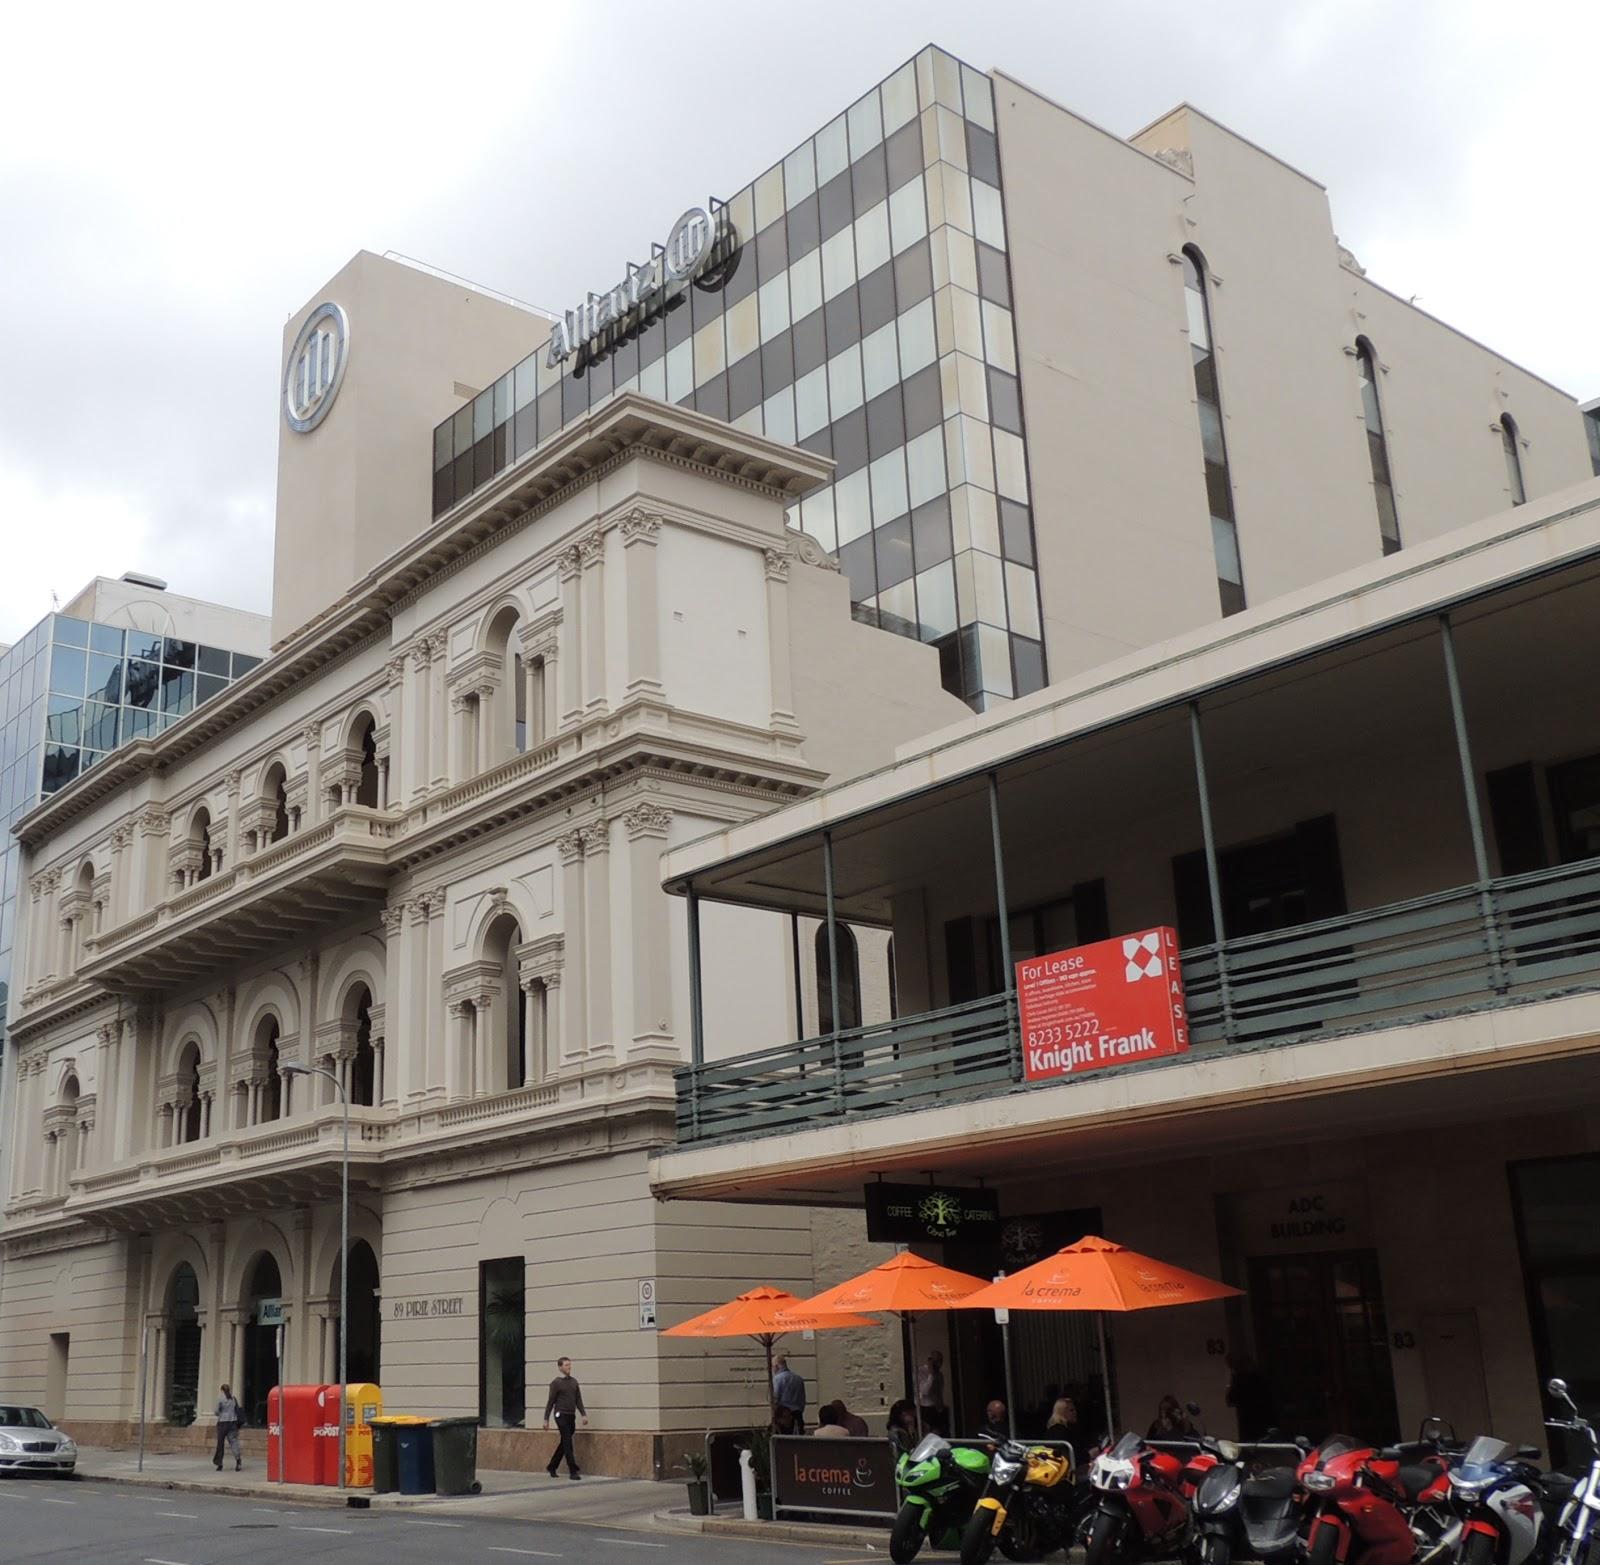 Adelaide unearthed enjoying adelaide history and architecture for Architecture adelaide uni